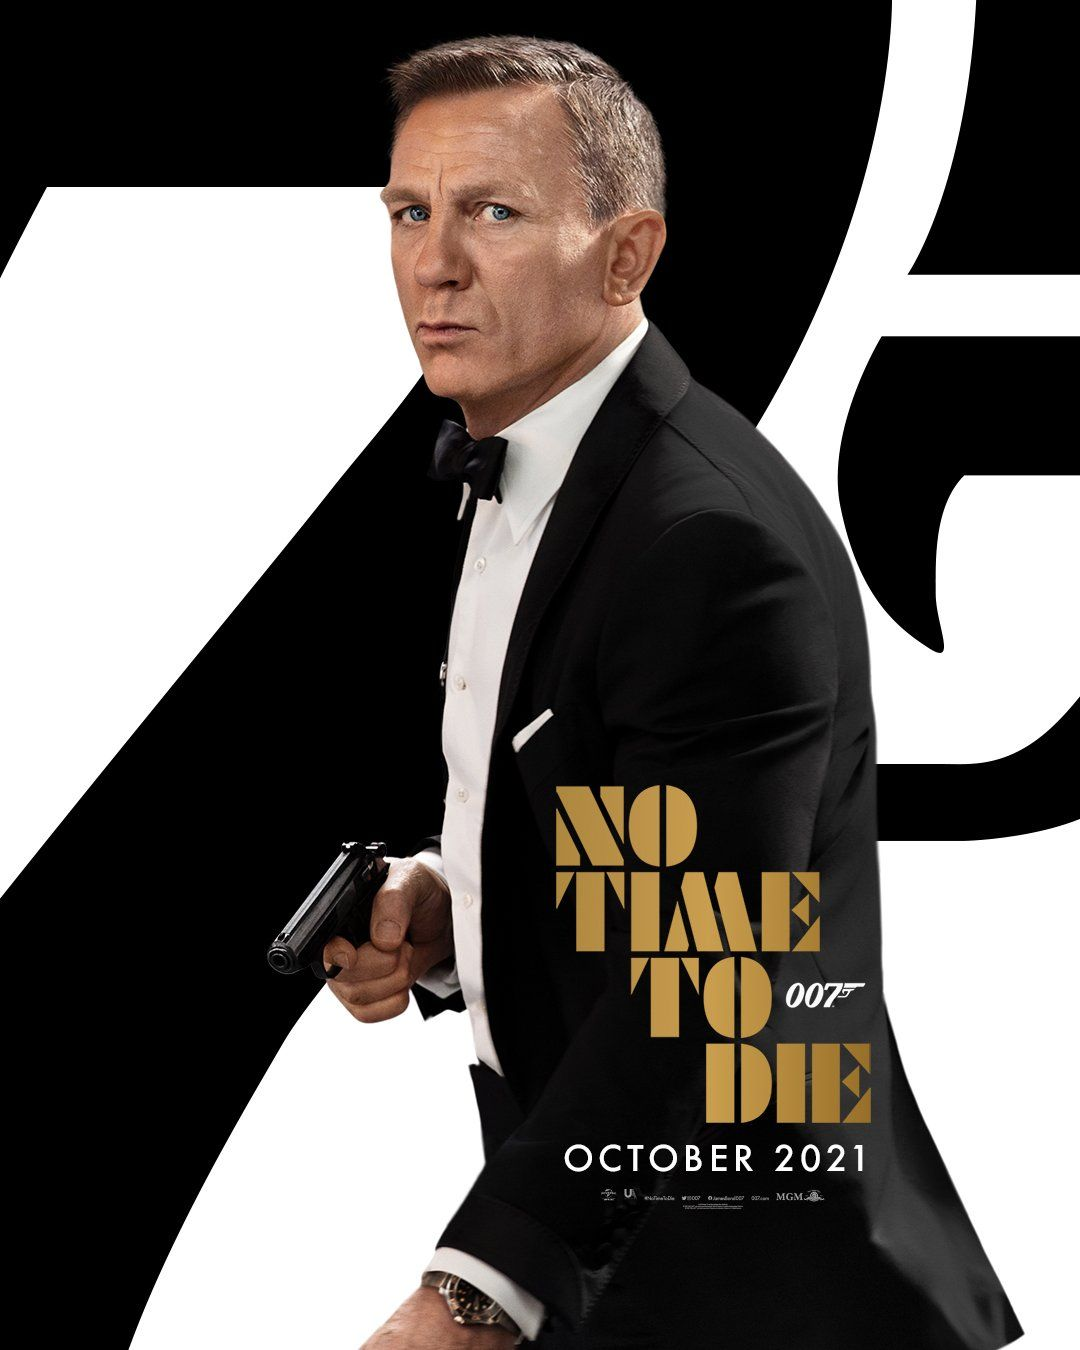 James Bond On Twitter In 2021 James Bond Movie Club James Bond Movies